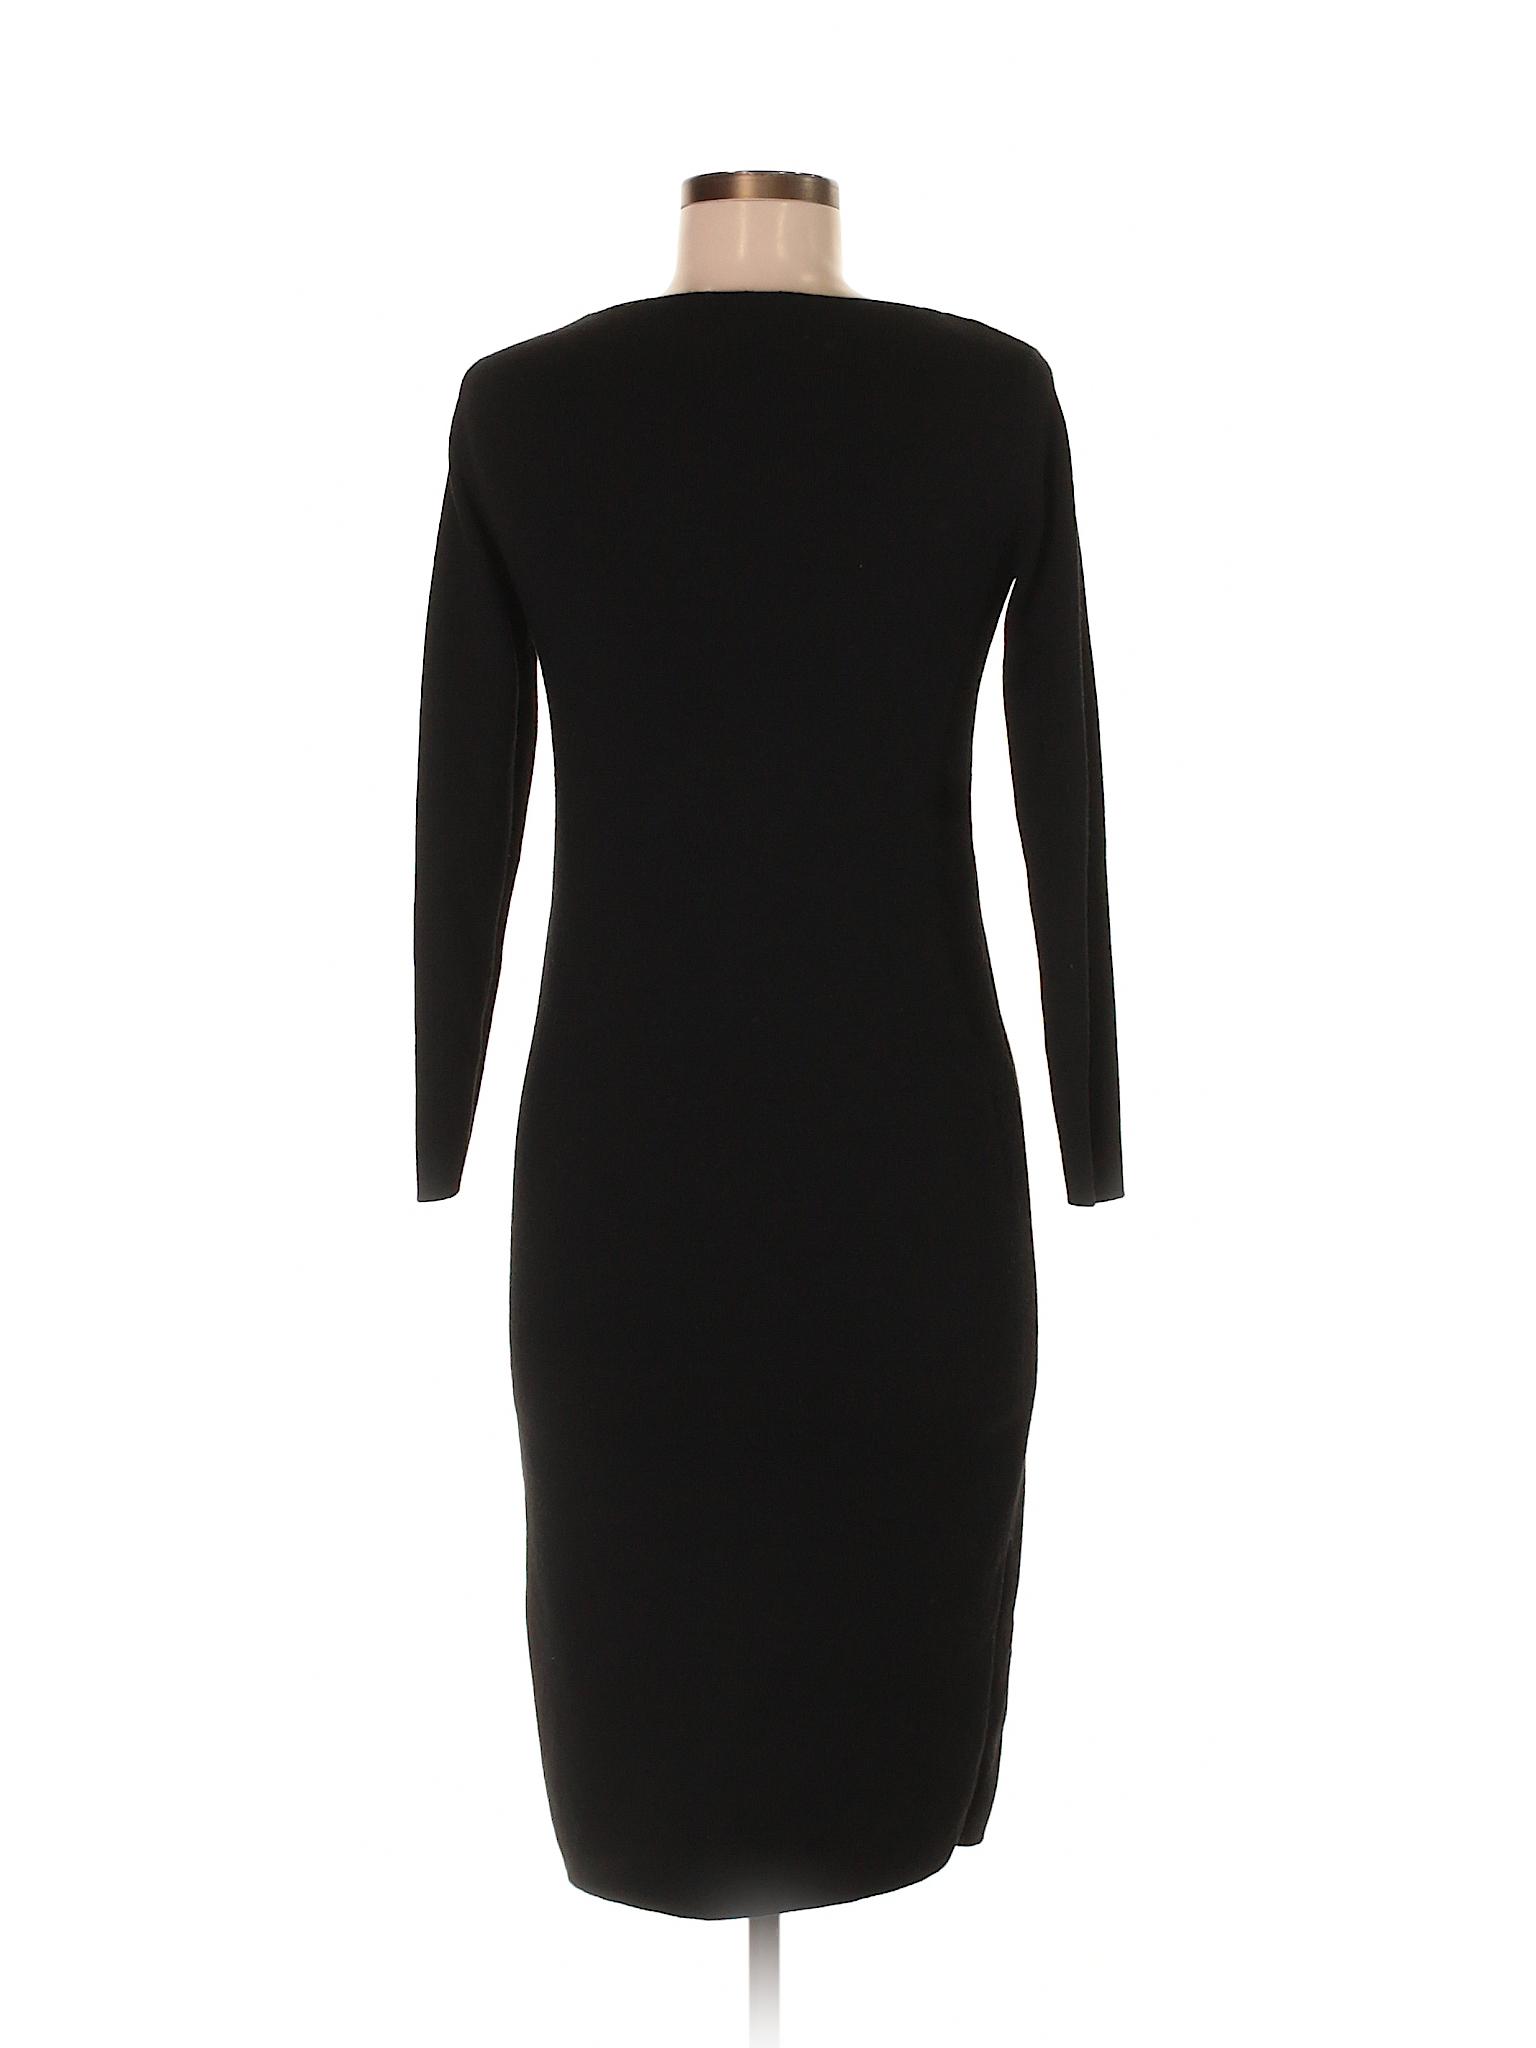 Uniqlo casual dress size black womenus dresses